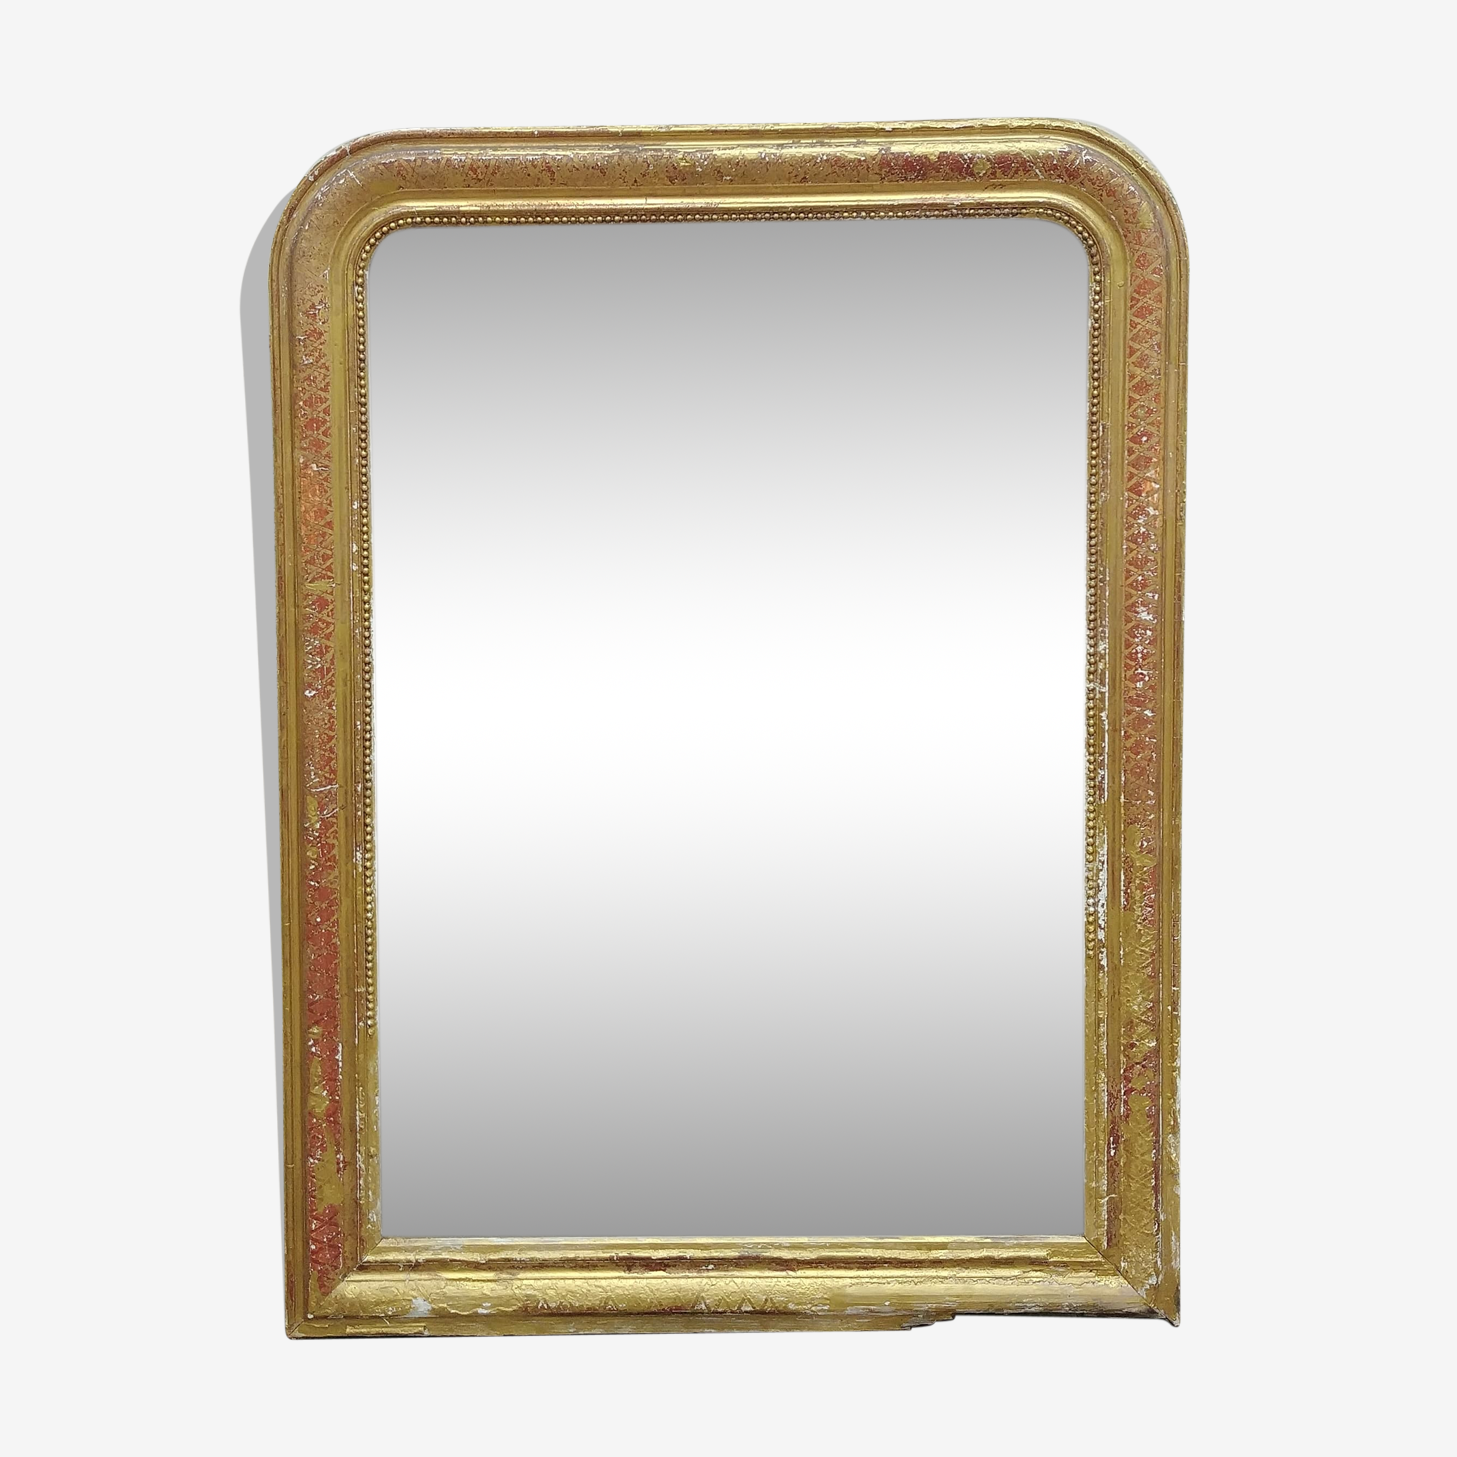 Miroir Louis Philippe ancien 88x118cm